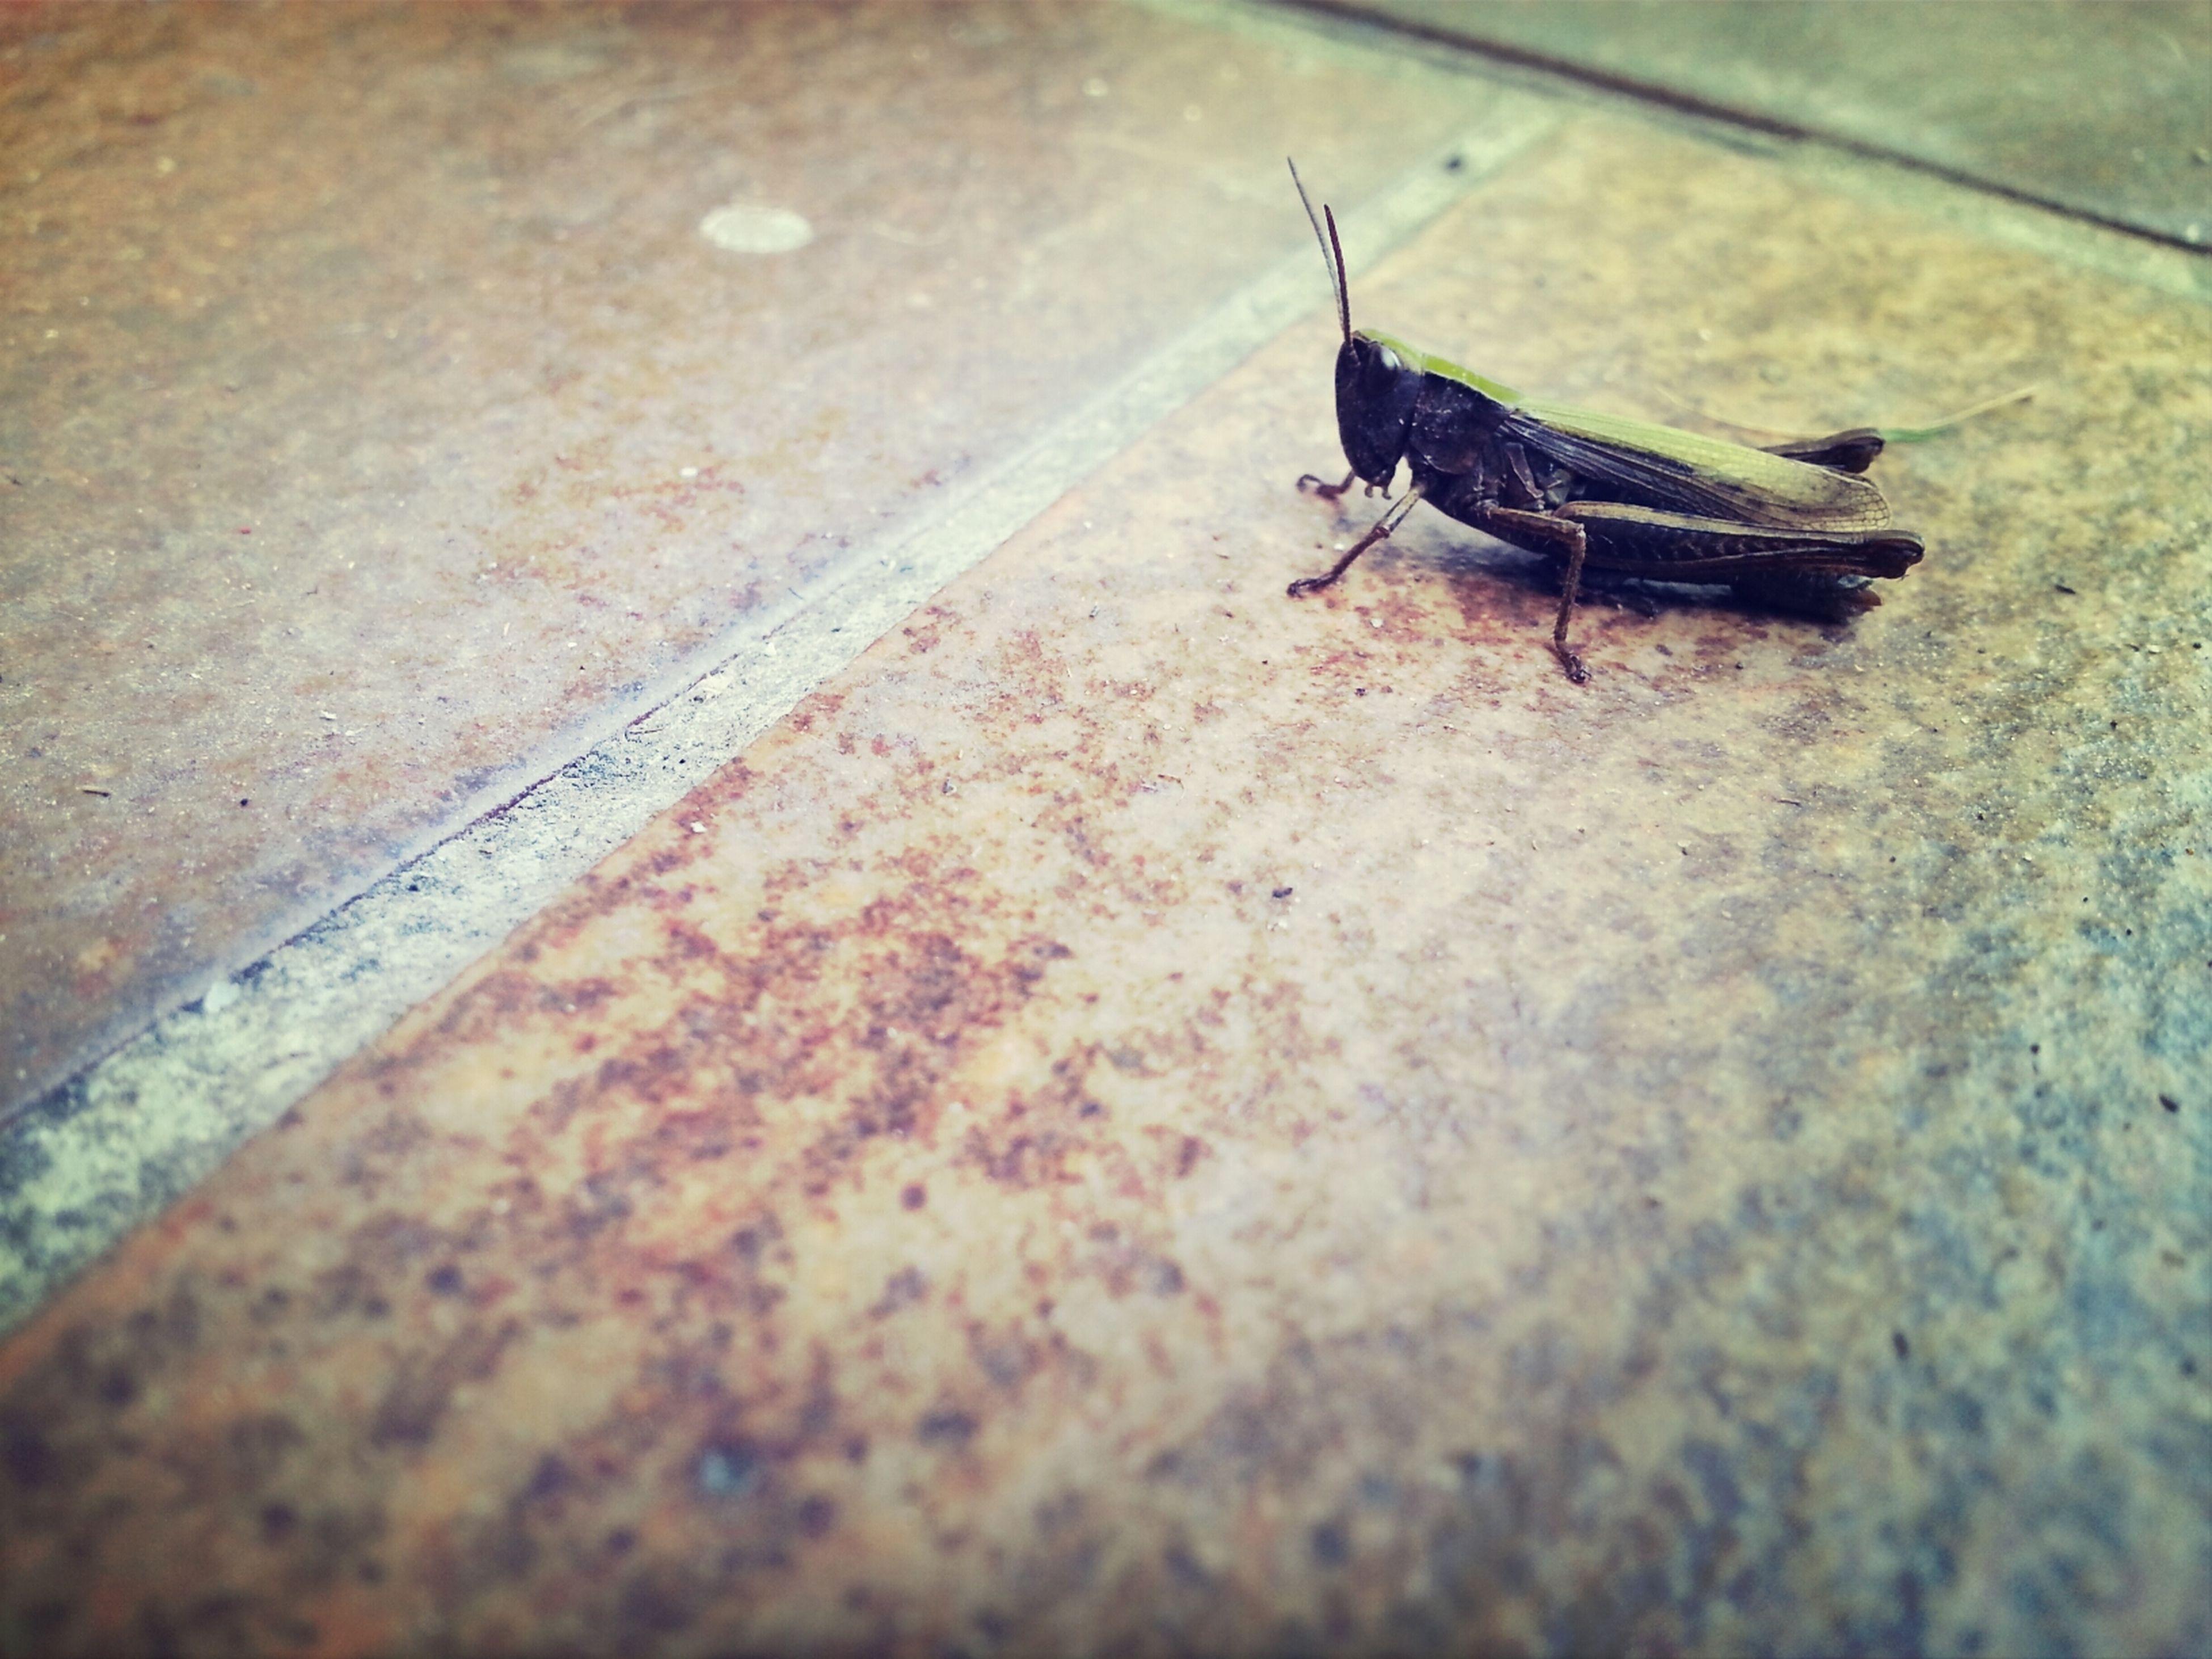 Grasshopper Photography Springpferd Kerlchen